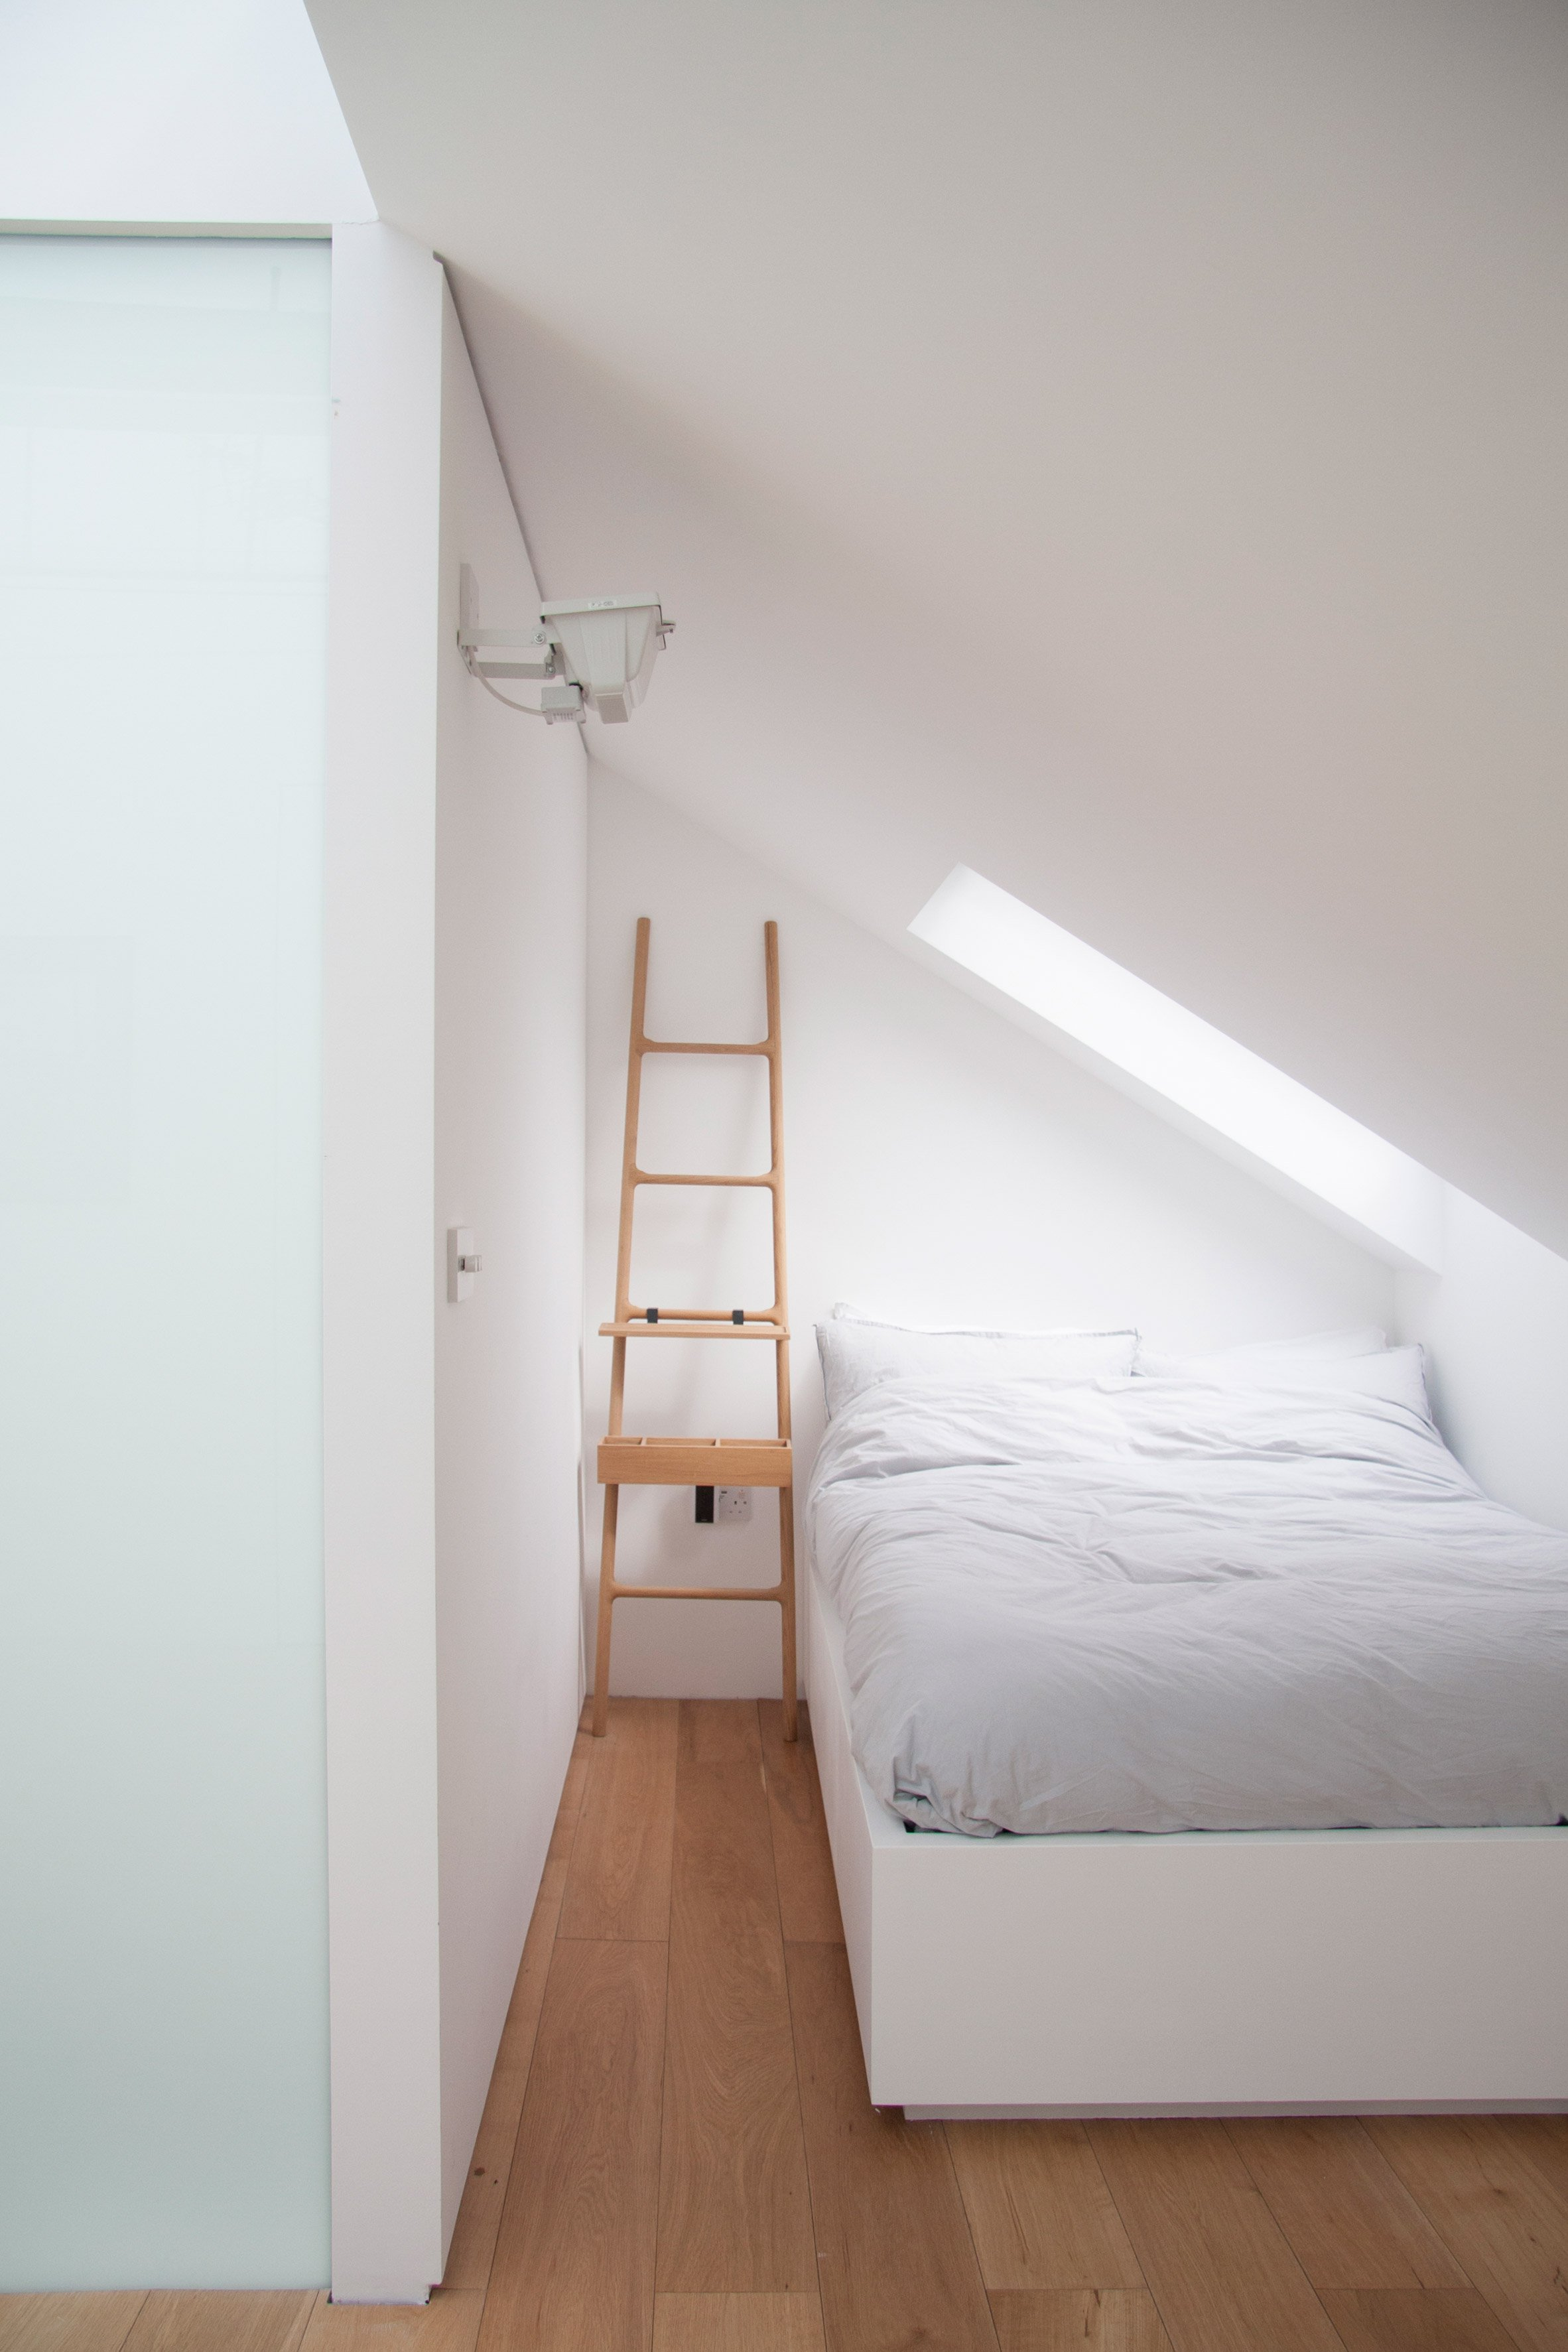 architecture-square-residence-interiors-design-studia-osnovadesign-osnova-poltava_09